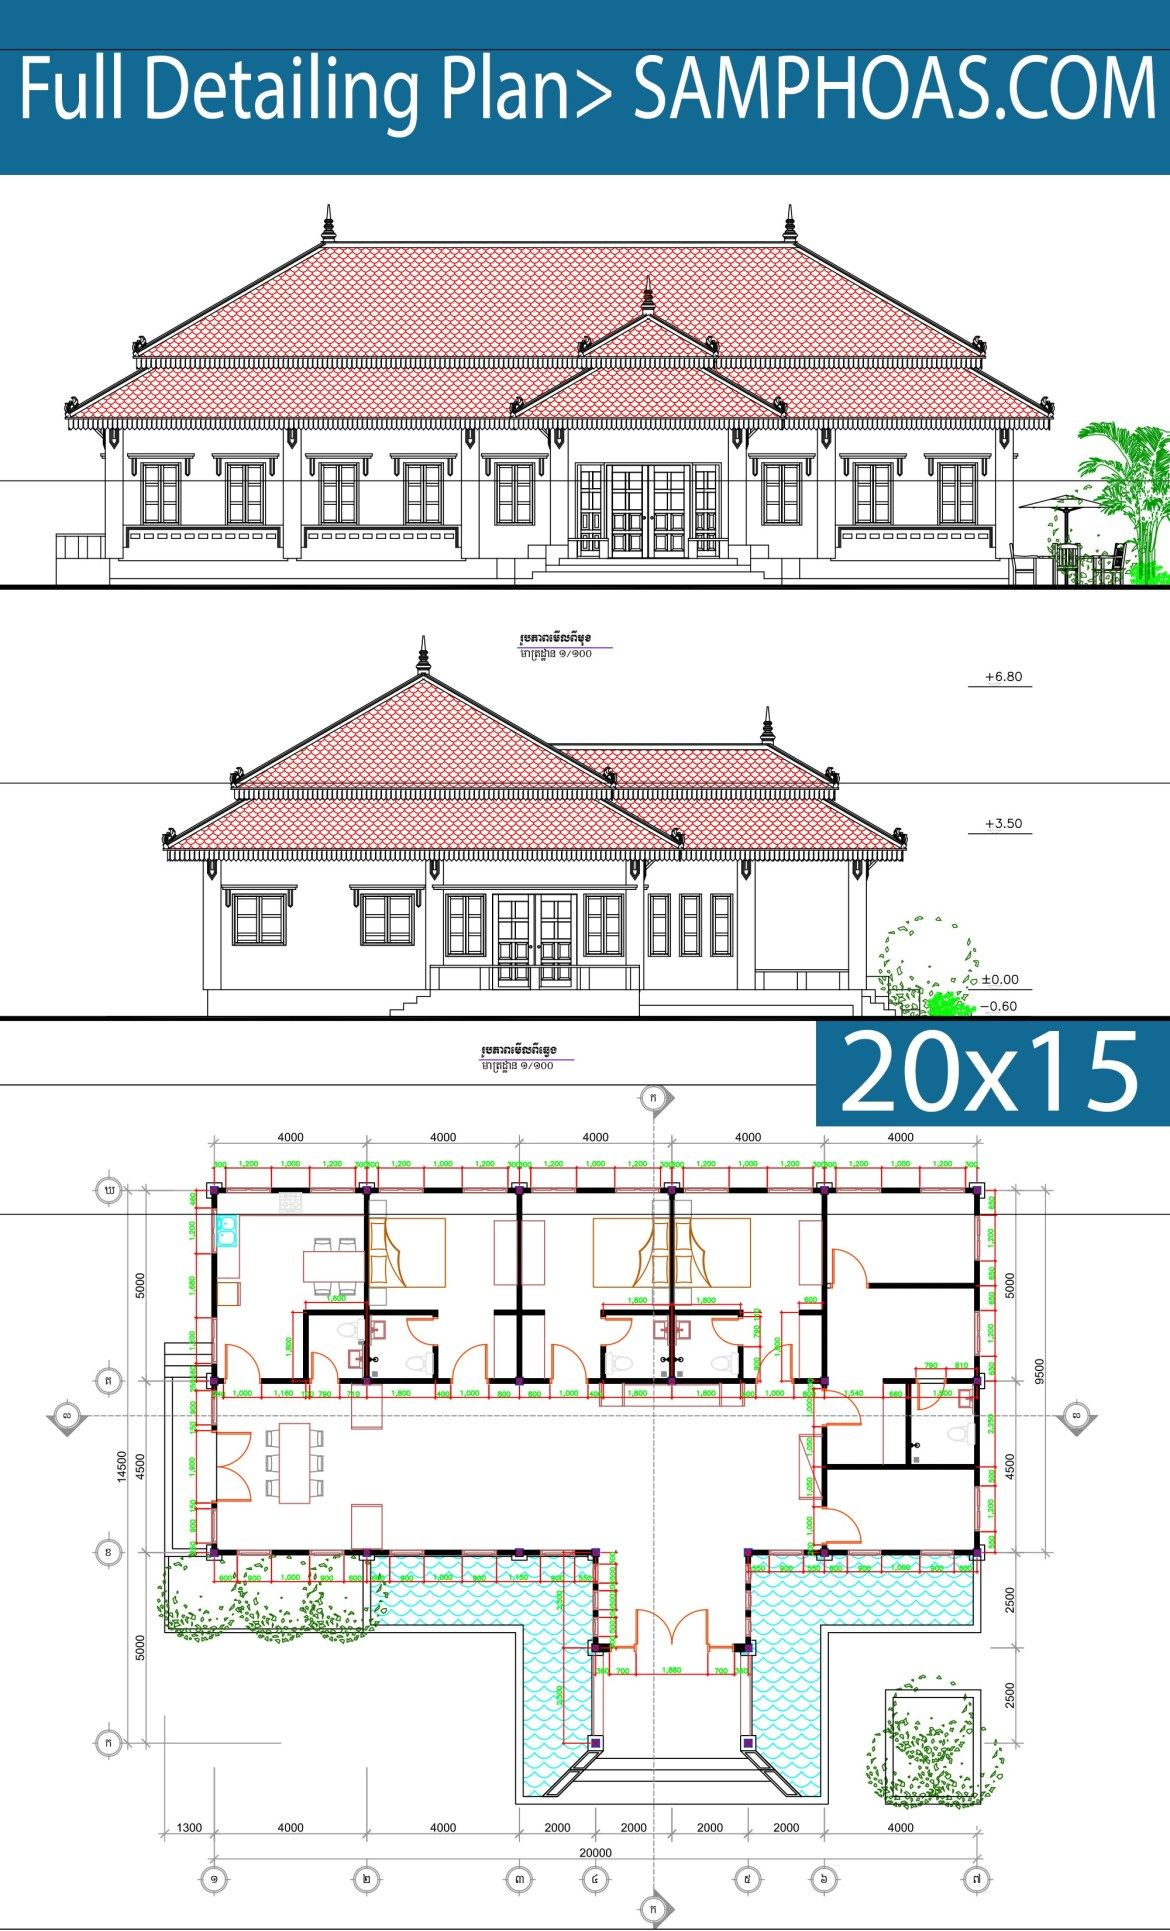 4 Bedrooms House Plan 20x14 5m Samphoas Plansearch Bungalow Floor Plans Bedroom House Plans 4 Bedroom House Plans